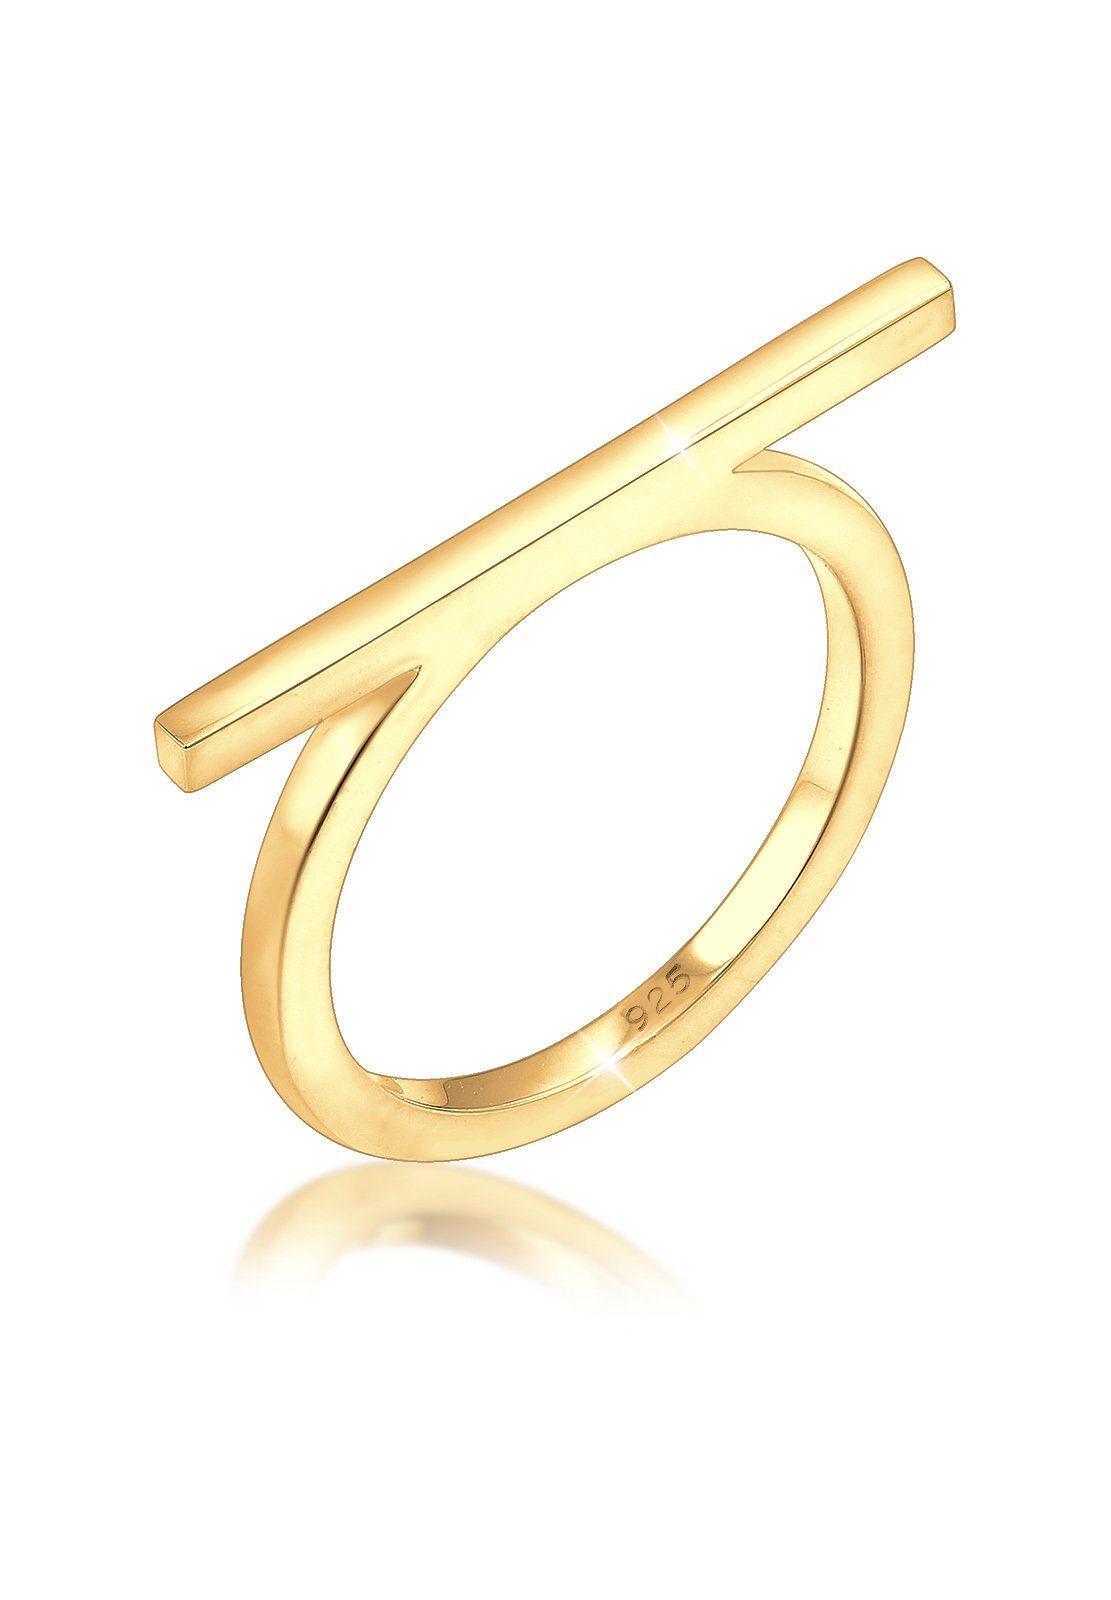 Elli Fingerring »Geo Minimal Blogger Trend Edgy 925 Sterling Silber« | Schmuck > Ringe > Fingerringe | Goldfarben | Elli